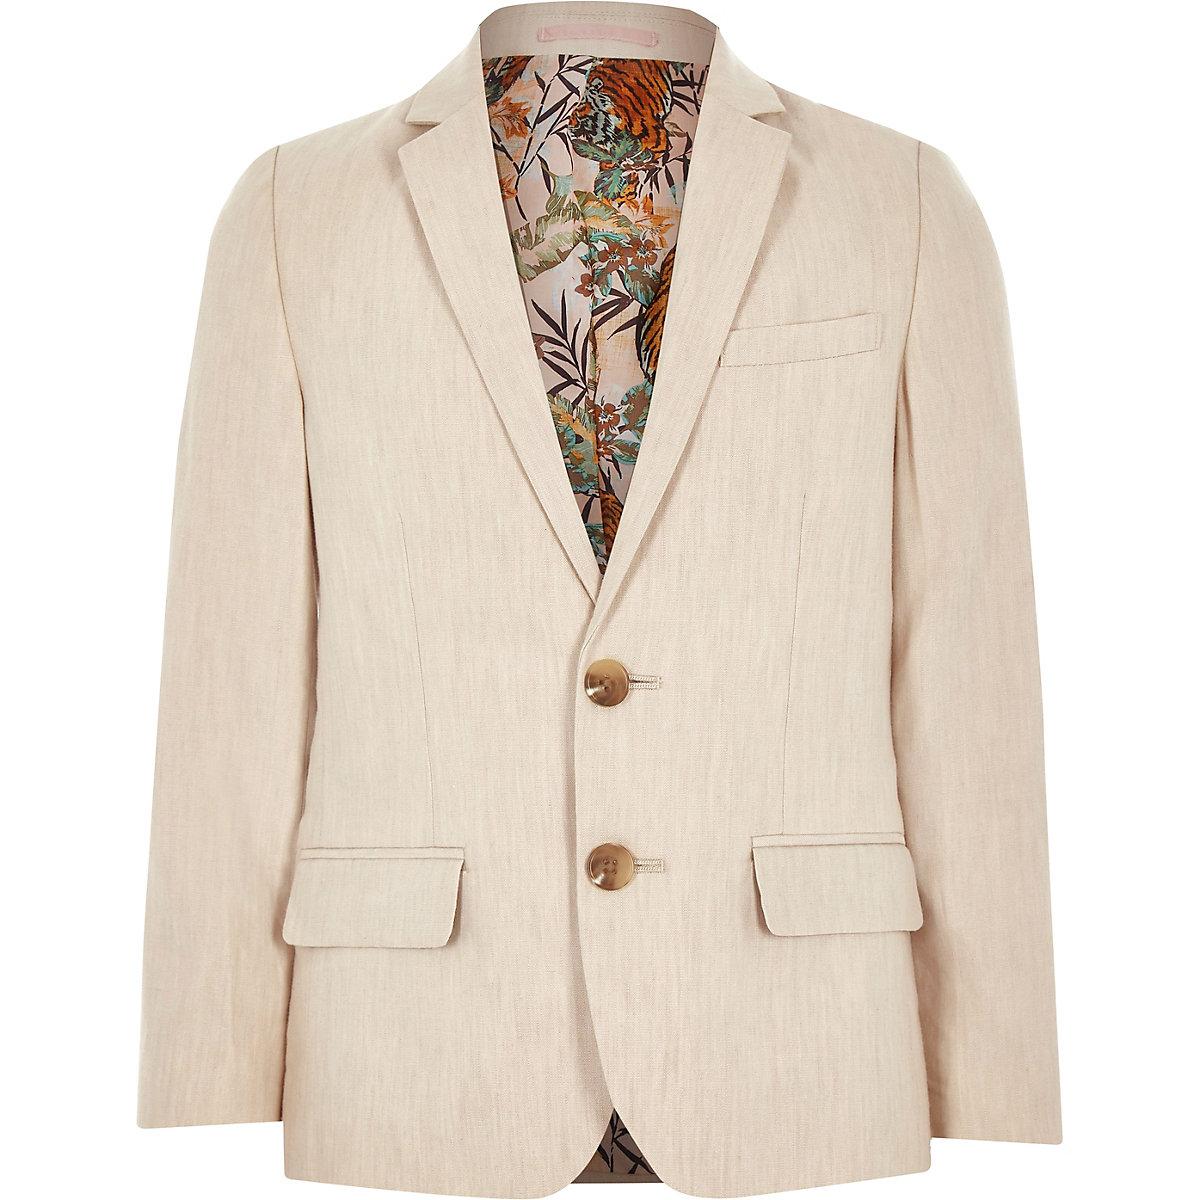 Boys cream linen suit blazer